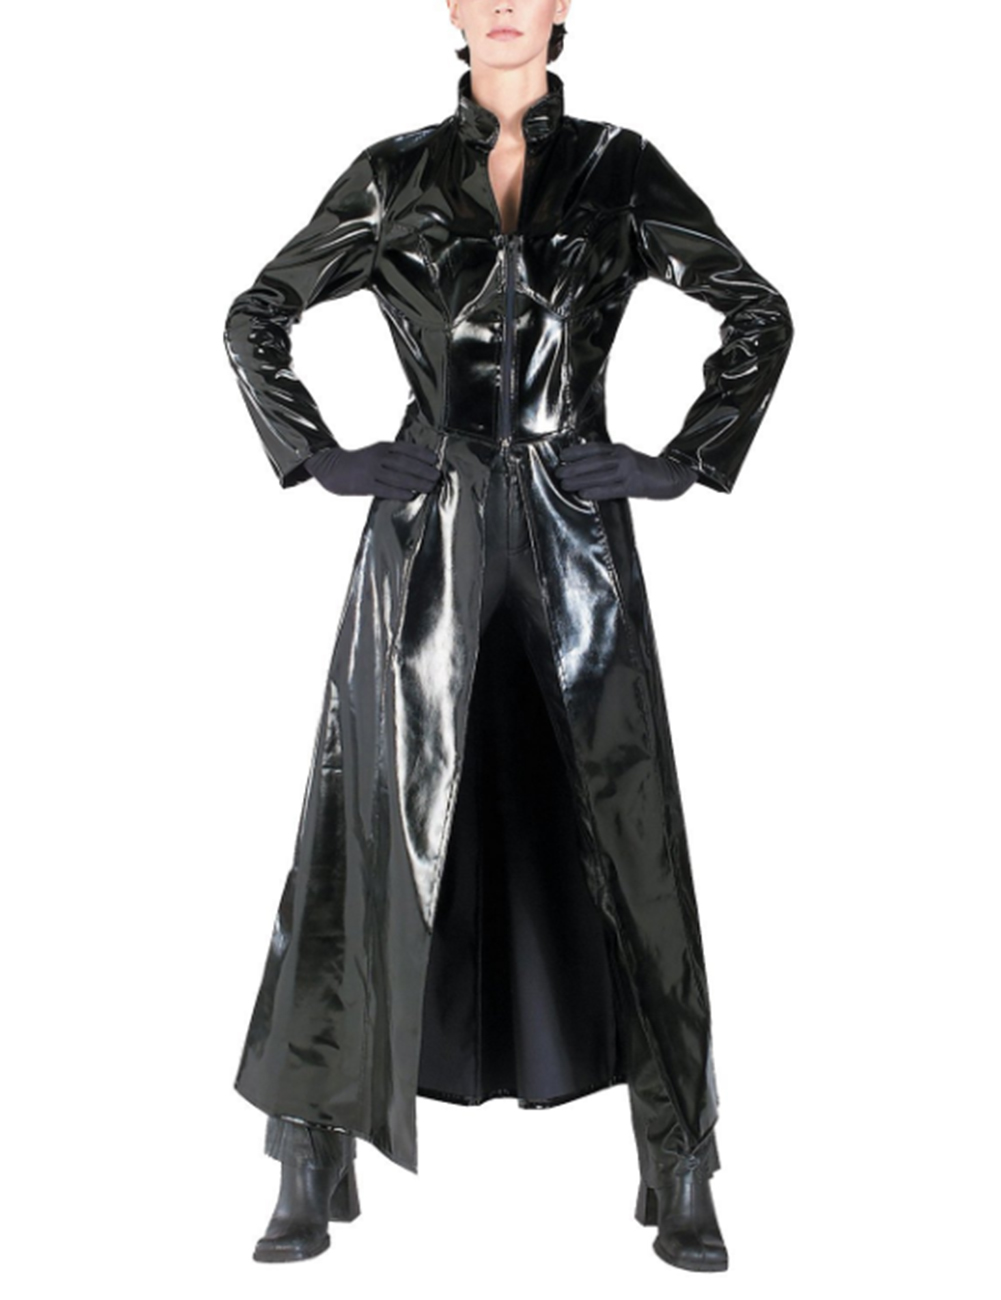 Unisex PVC Leather Matrix Coat Sexy Reloaded Trinity Reloaded Long Bodysuit Halloween Cosplay Adult Costume Black_XL